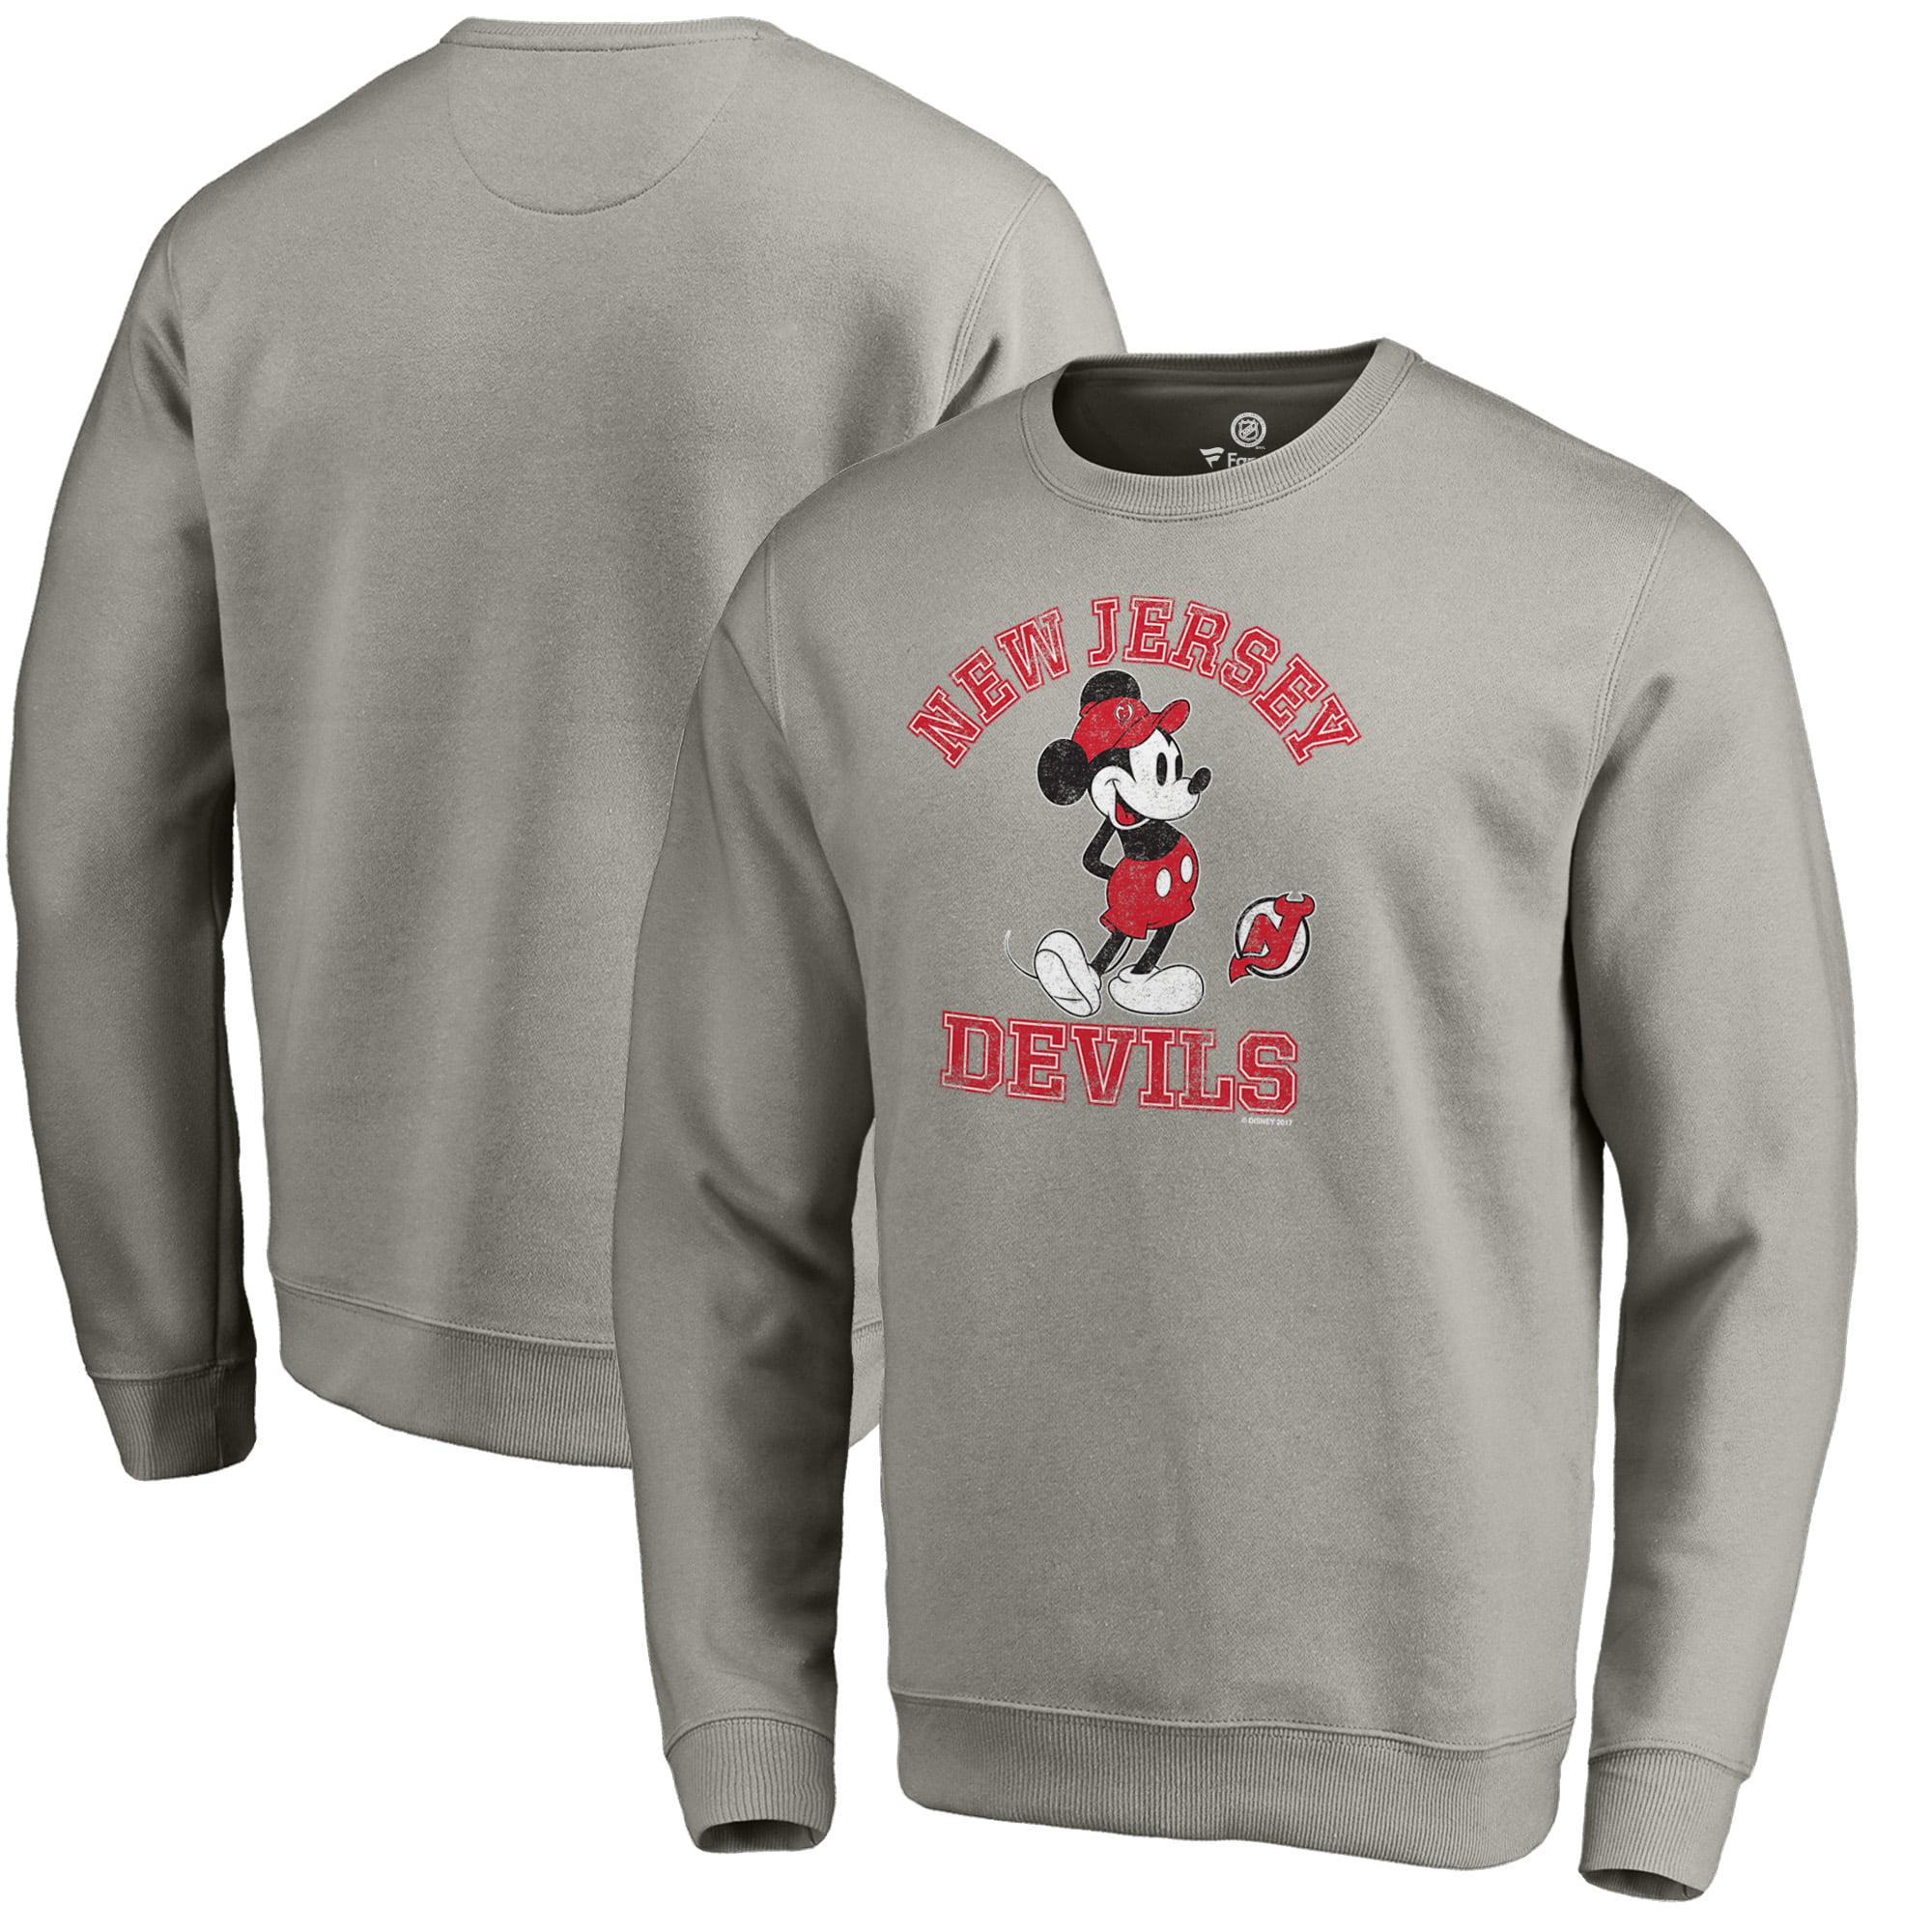 New Jersey Devils Fanatics Branded Disney Tradition Sweatshirt - Heathered Gray